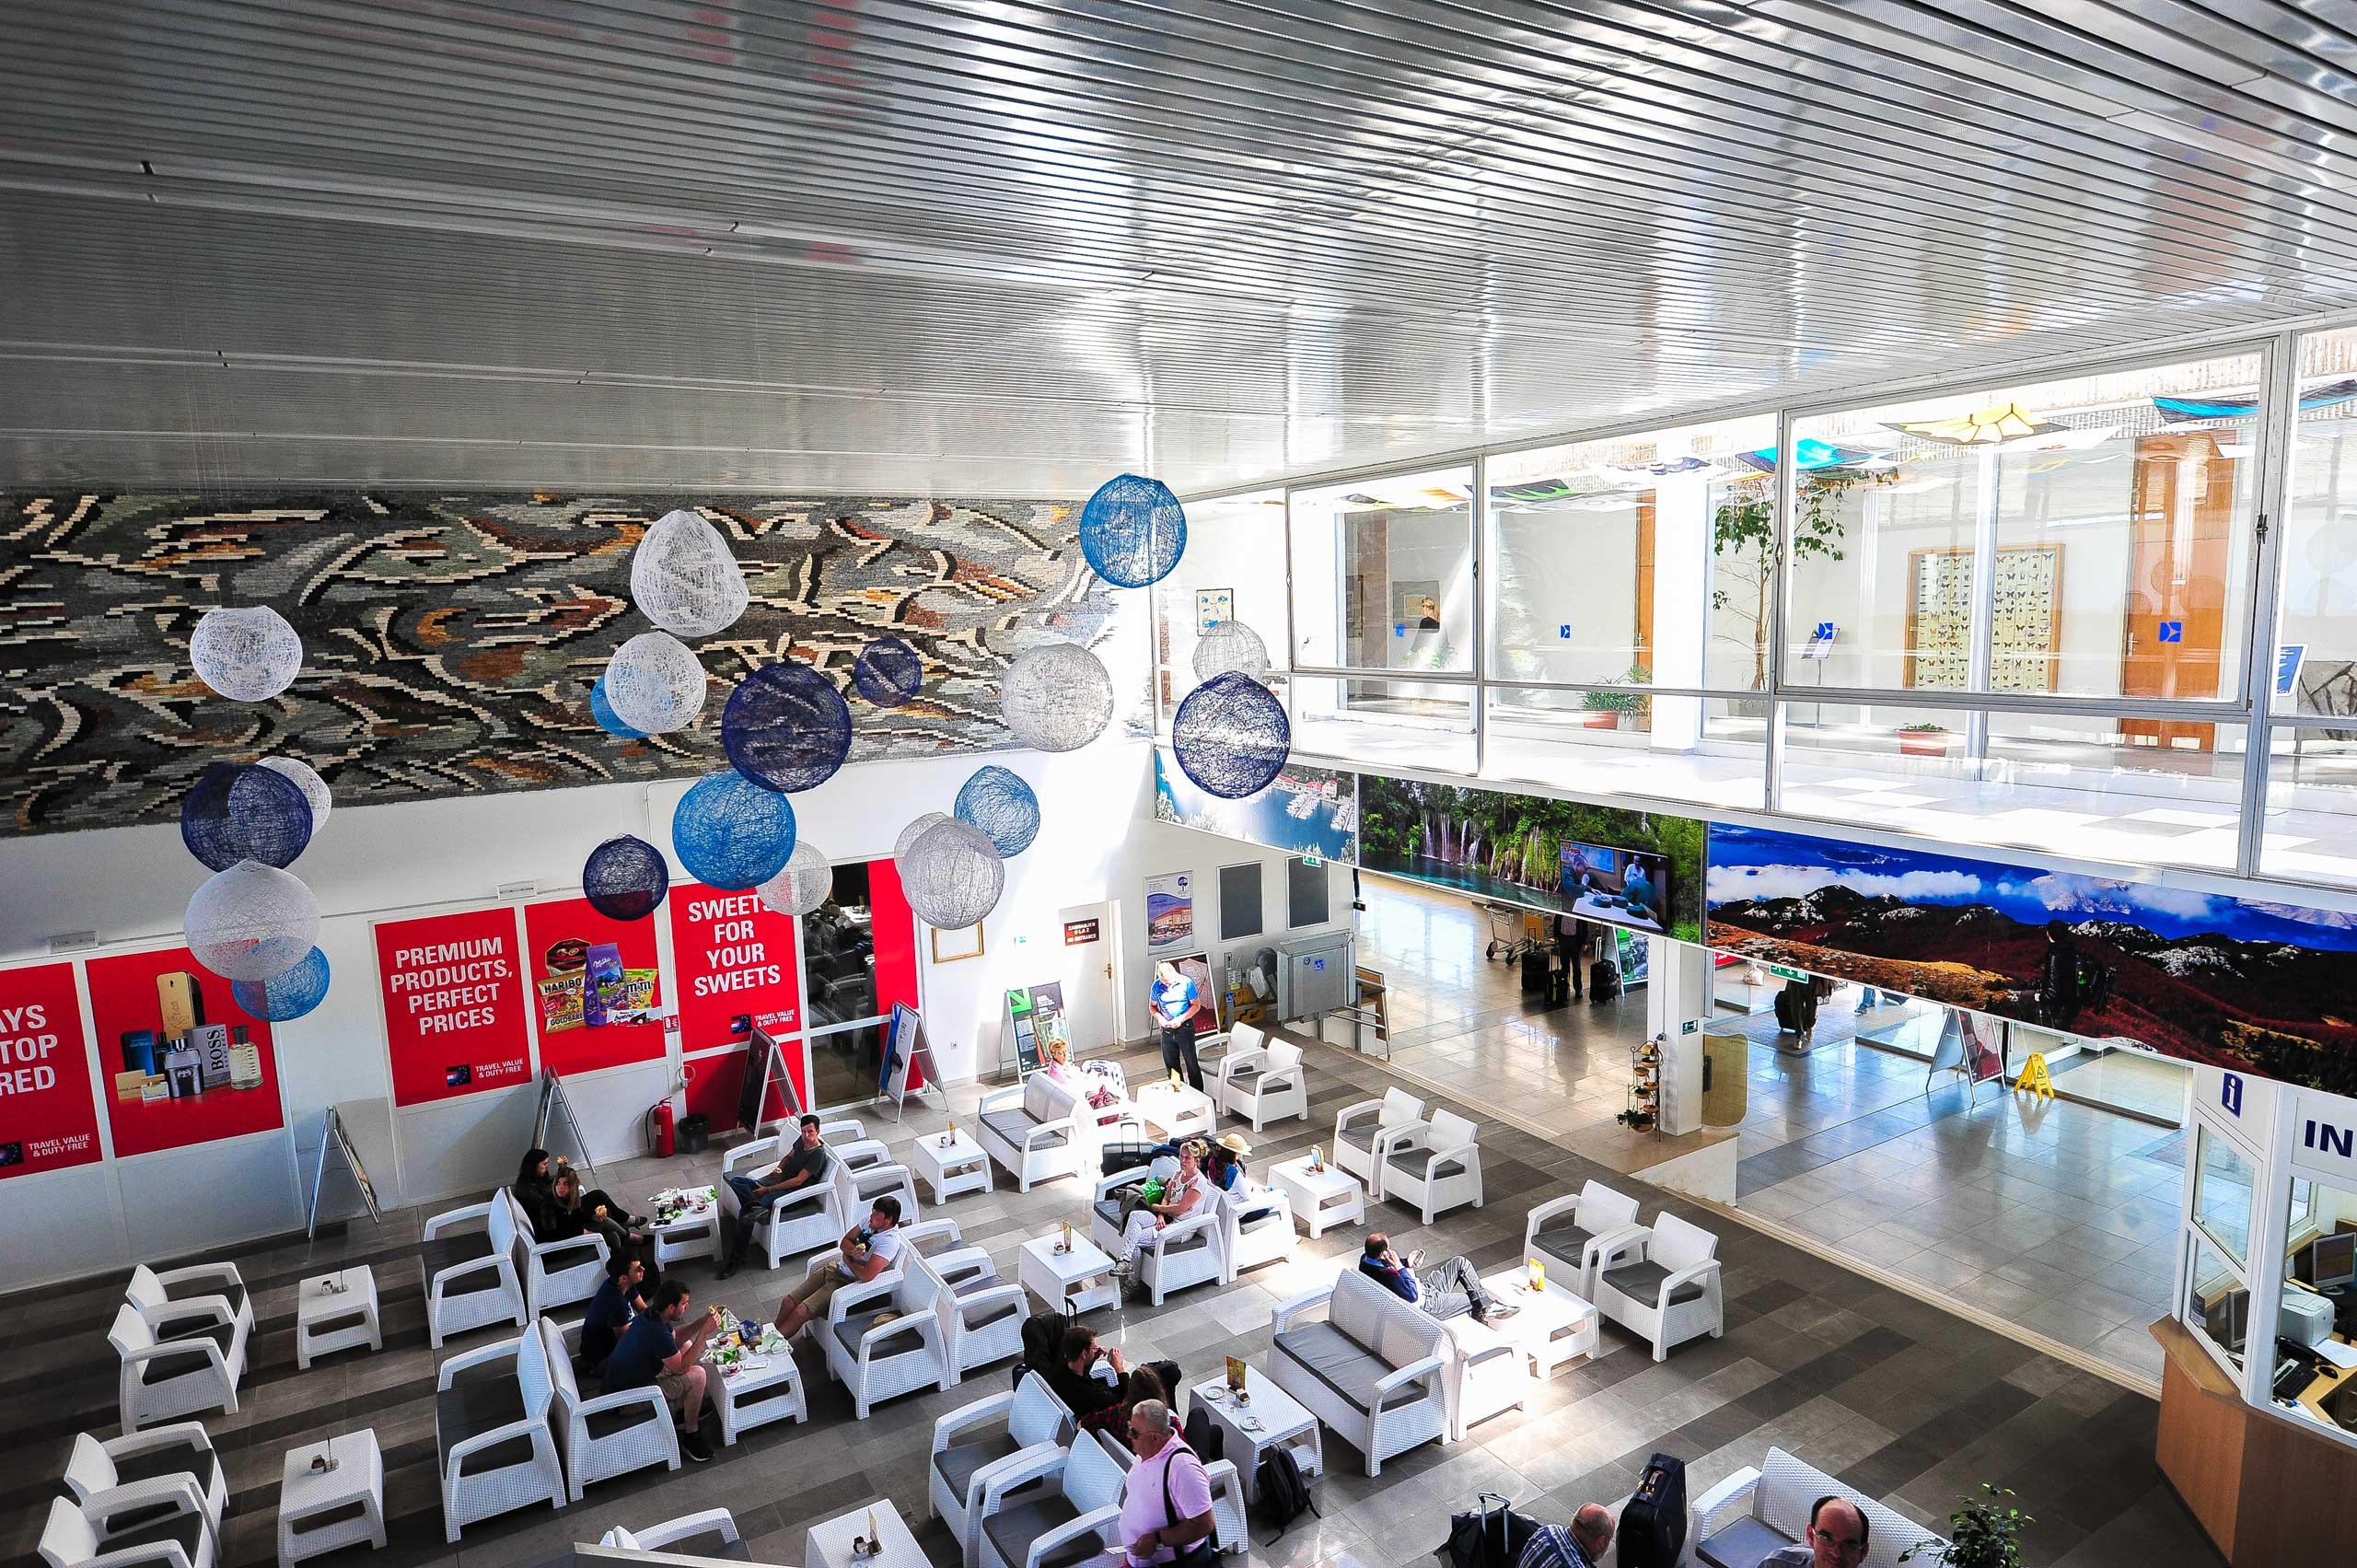 Croatia - Kvarner - Rijeka Airport